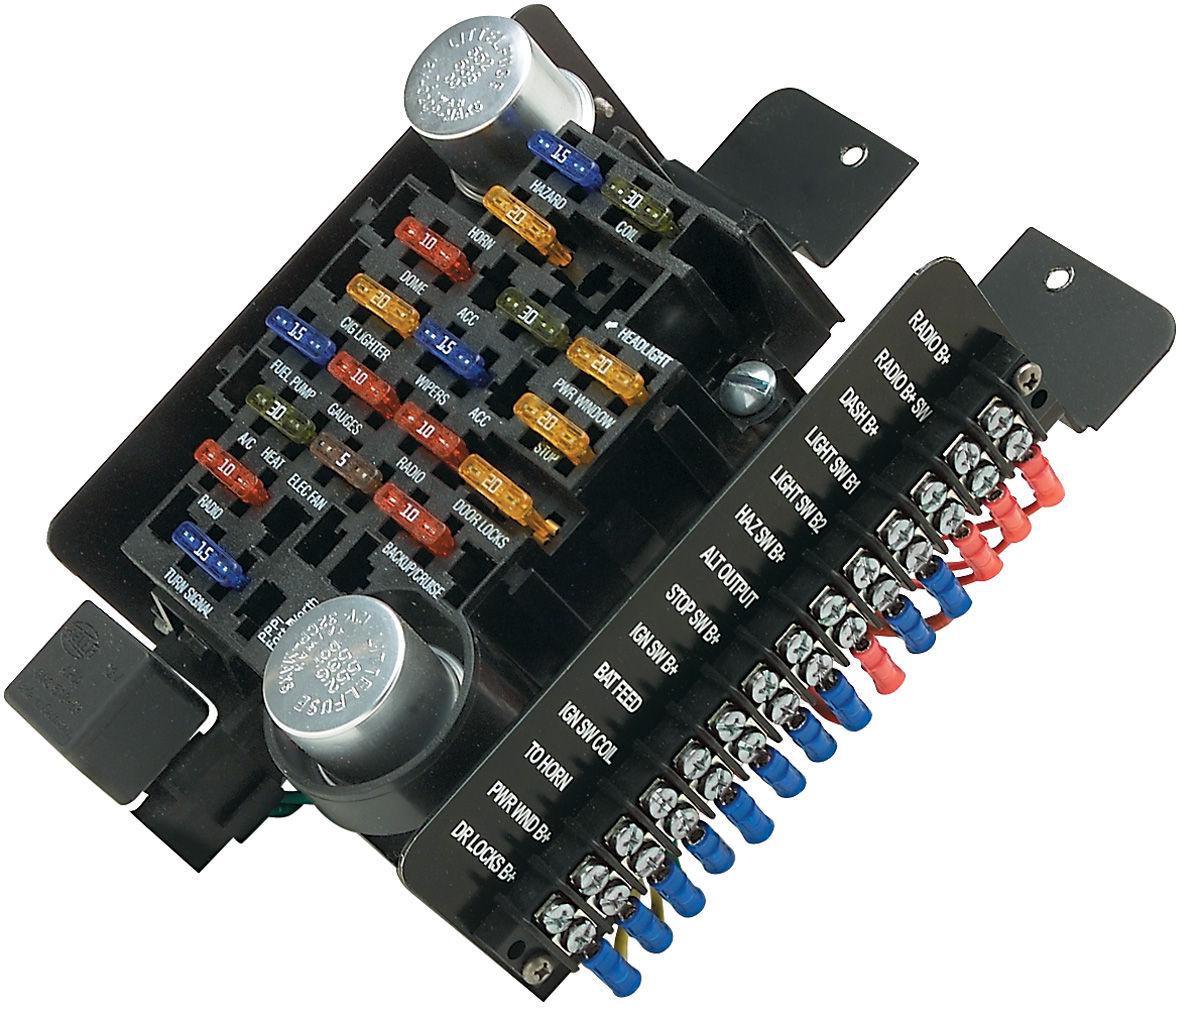 hight resolution of fuse box 1985 el camino ss choo choo custom simple wiring diagram rh 58 lodge finder de 79 cutlass 85 cutlass fuse box